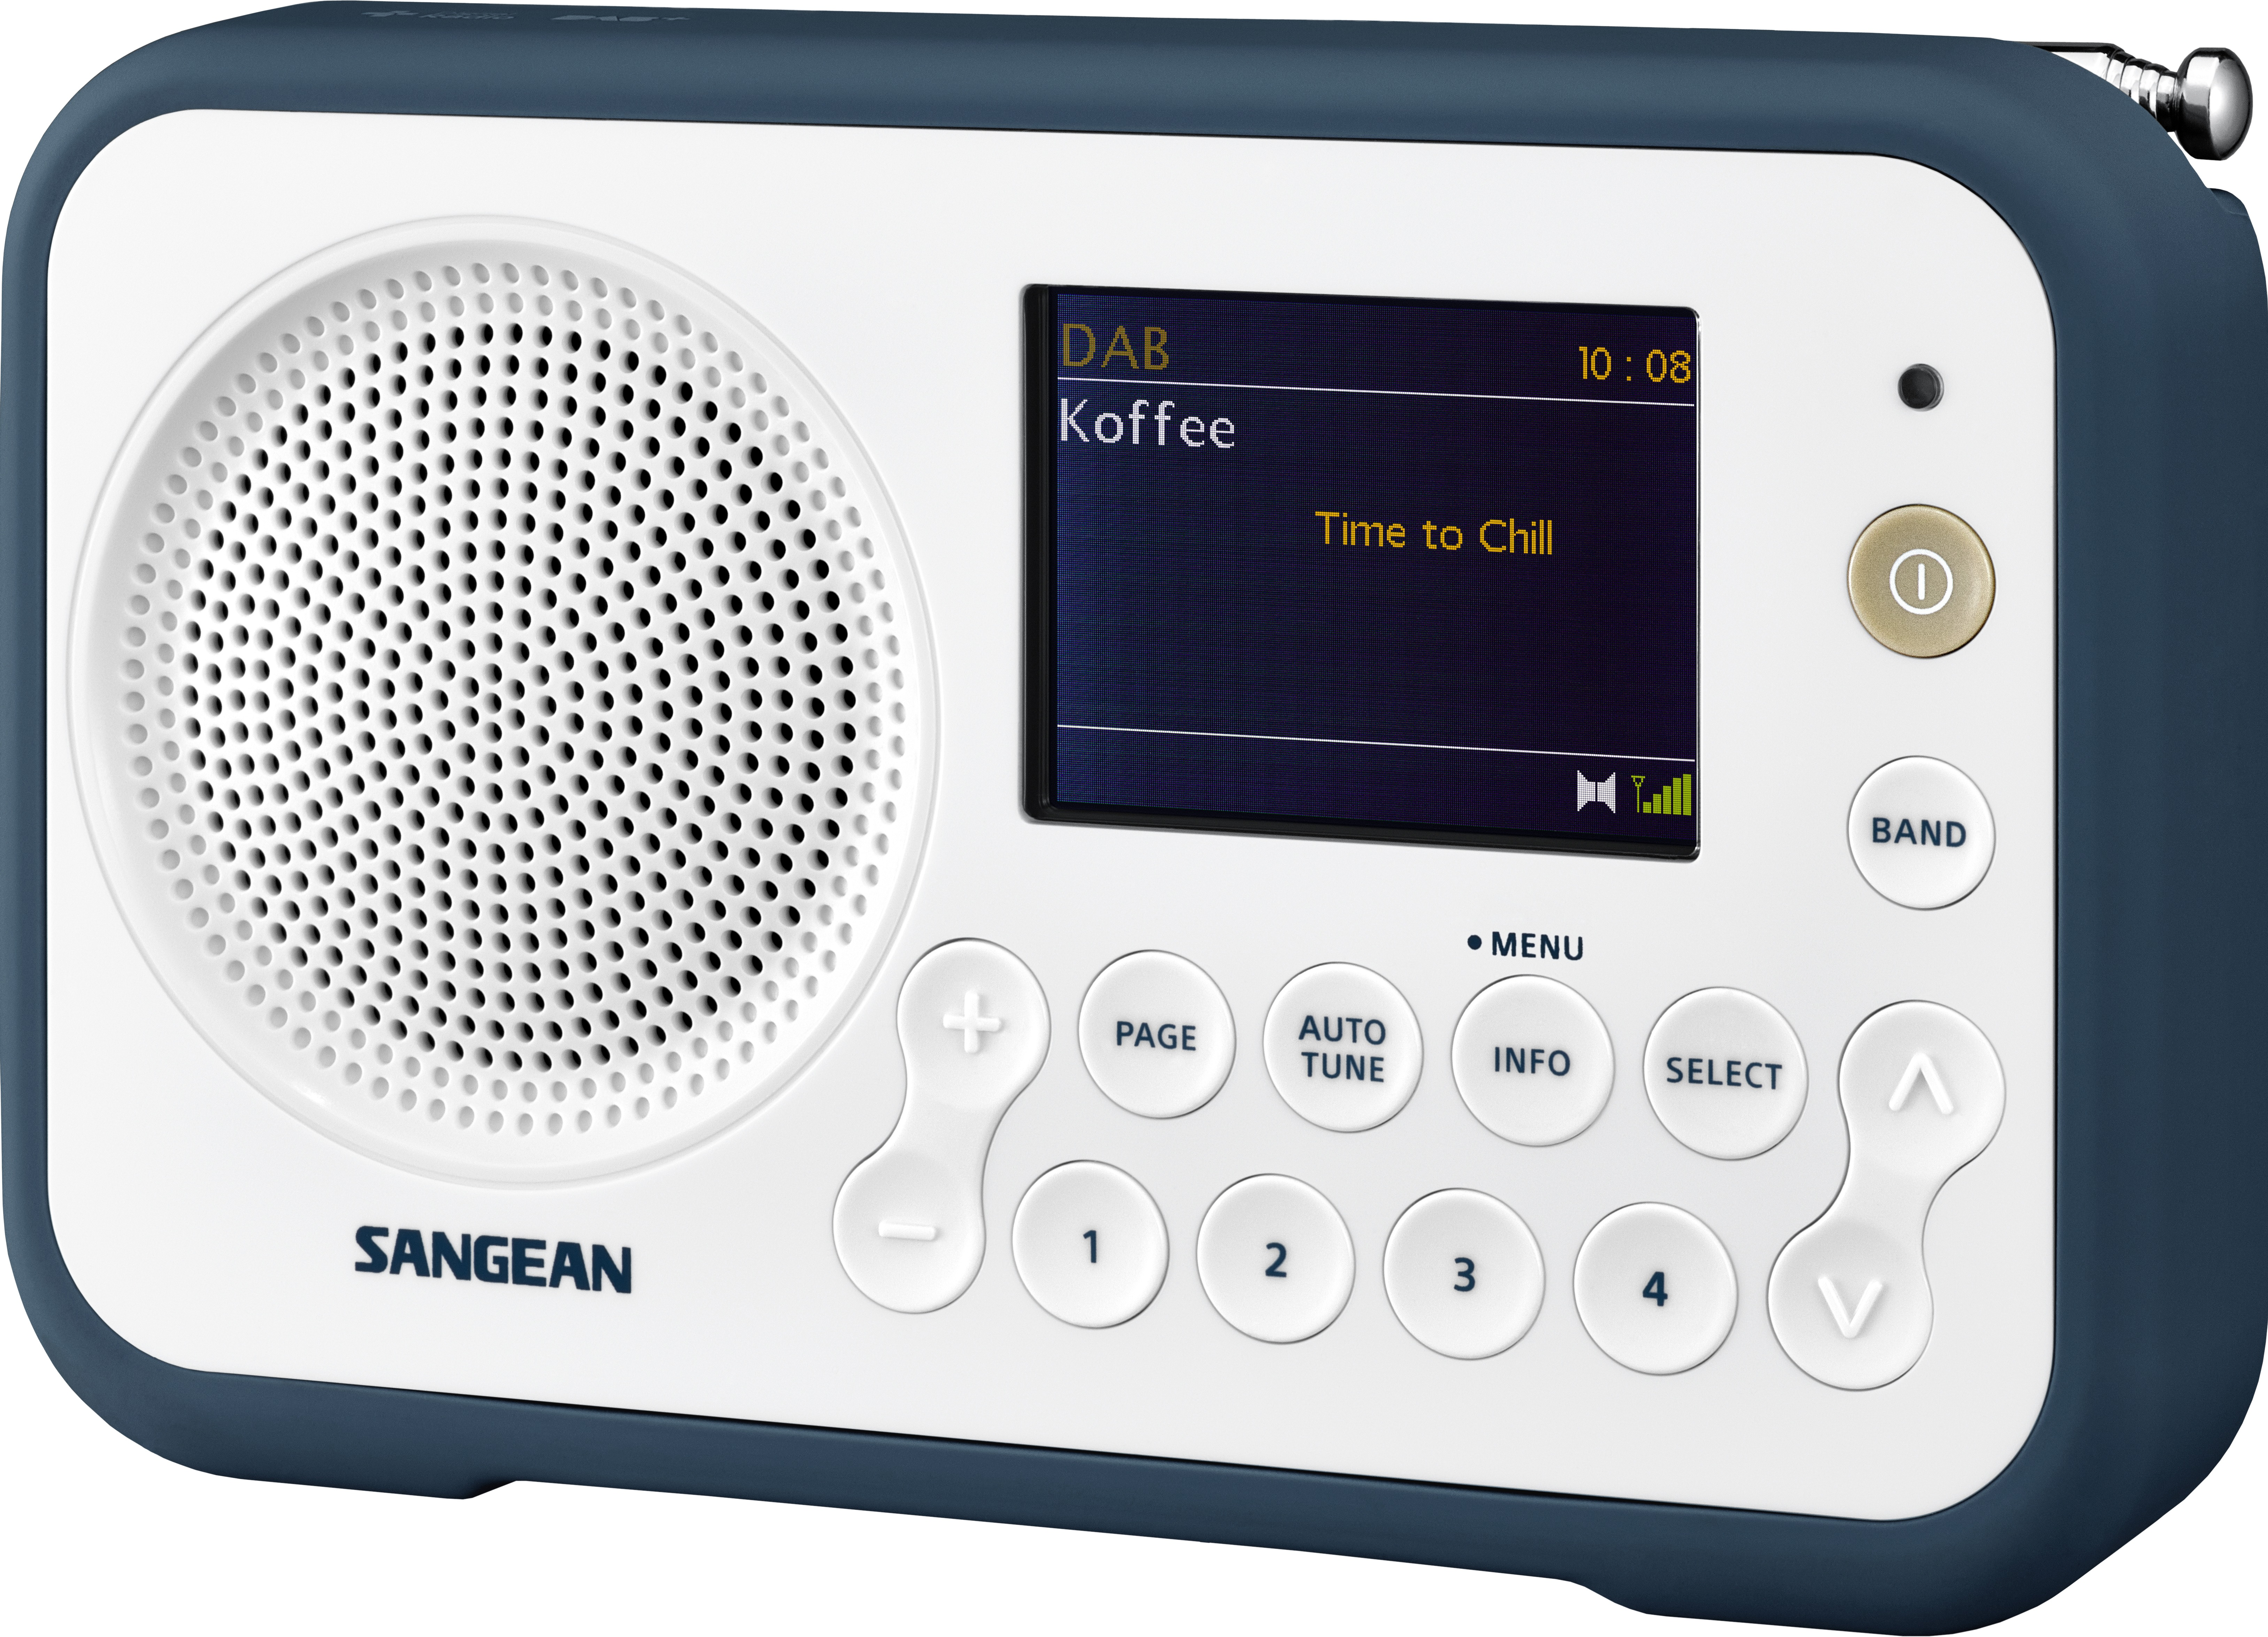 Sangean DPR 76 DAB DAB radio